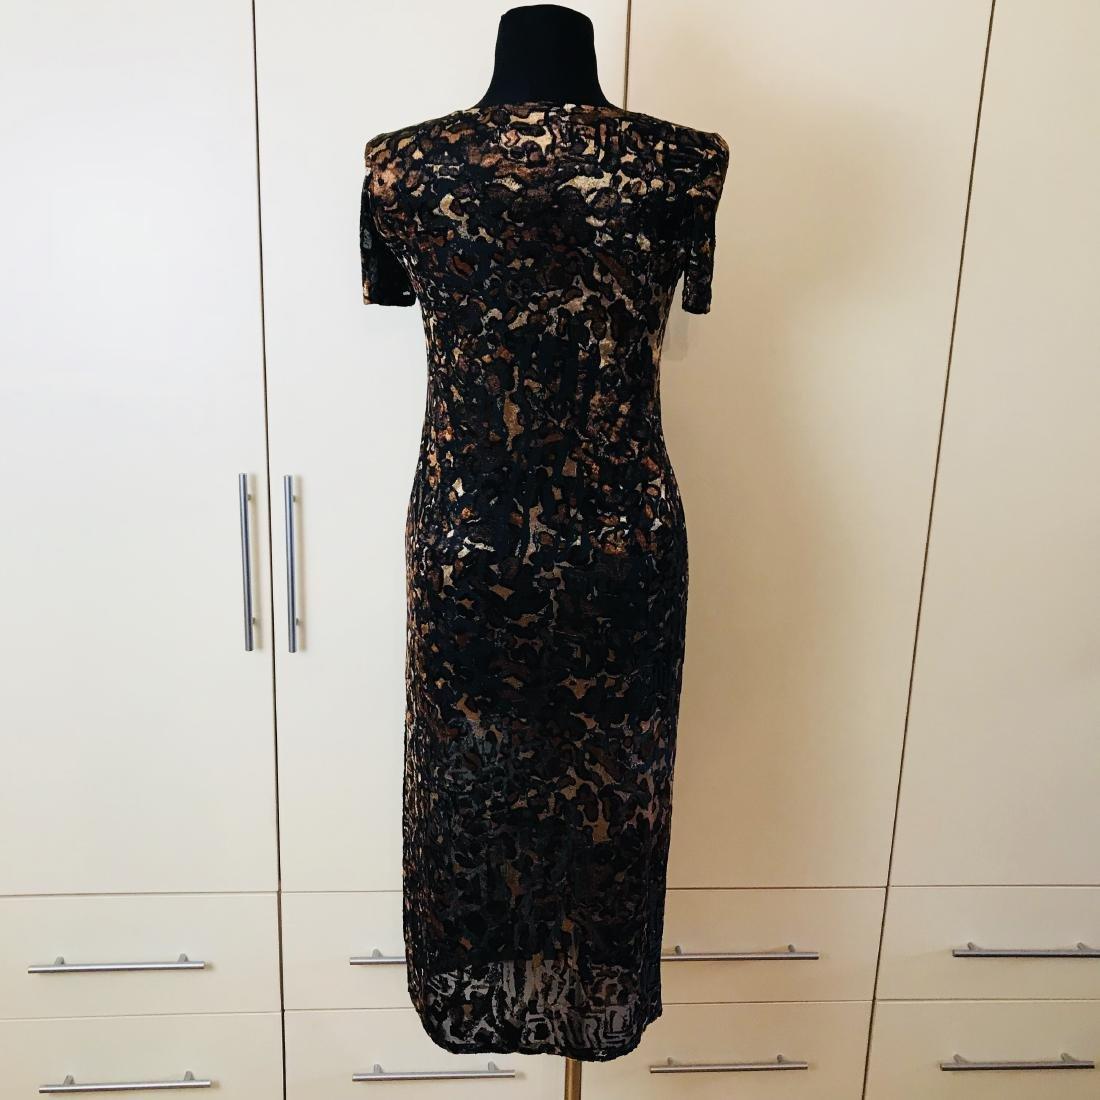 Vintage Women's Althea Designer Dress Size EUR 40 US 10 - 4